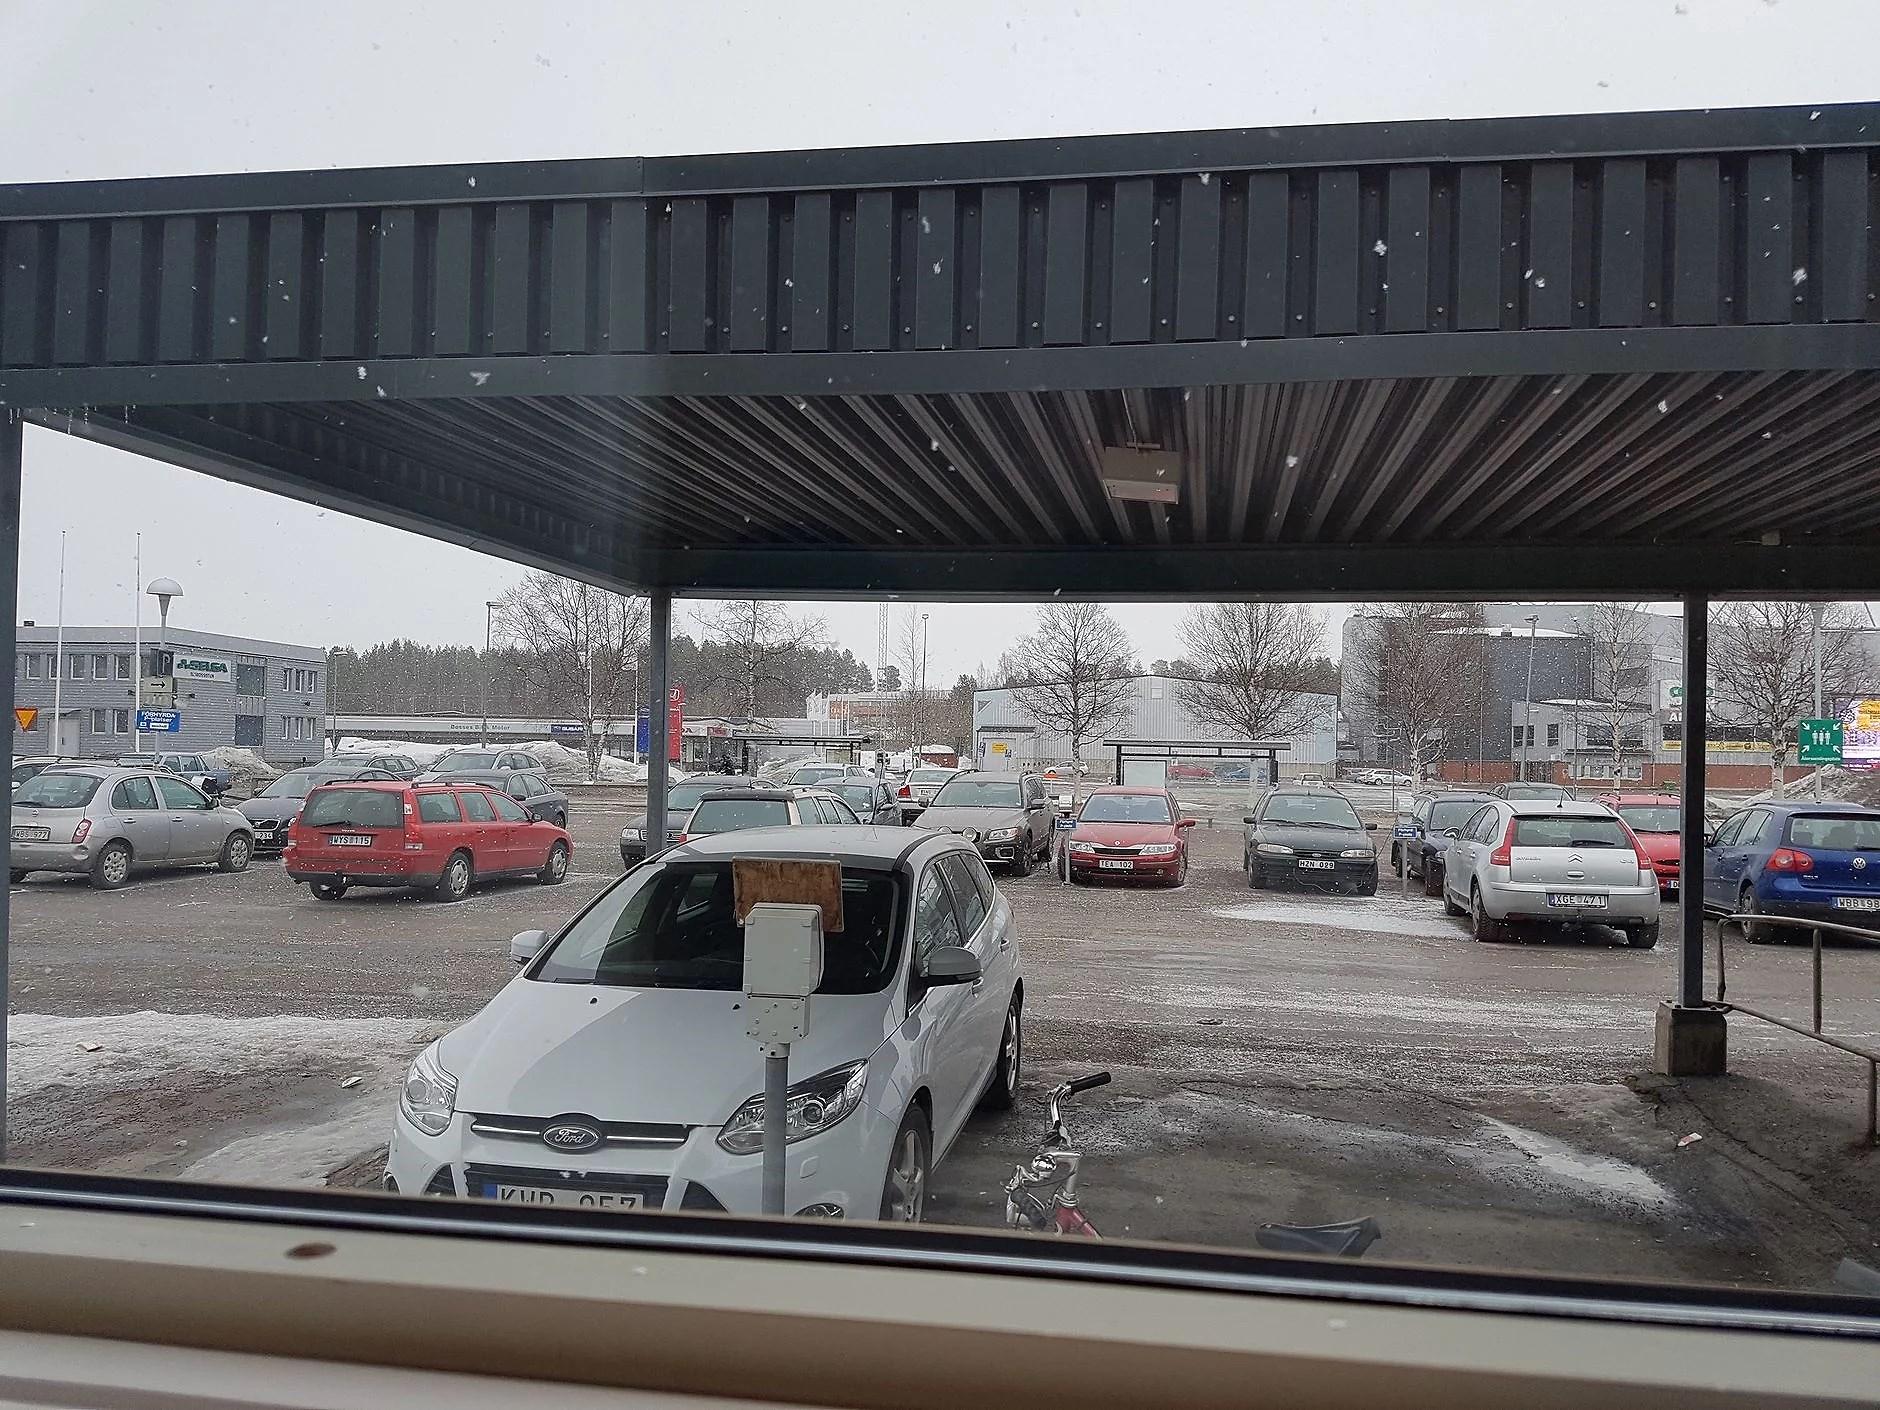 Aprilväder... :/